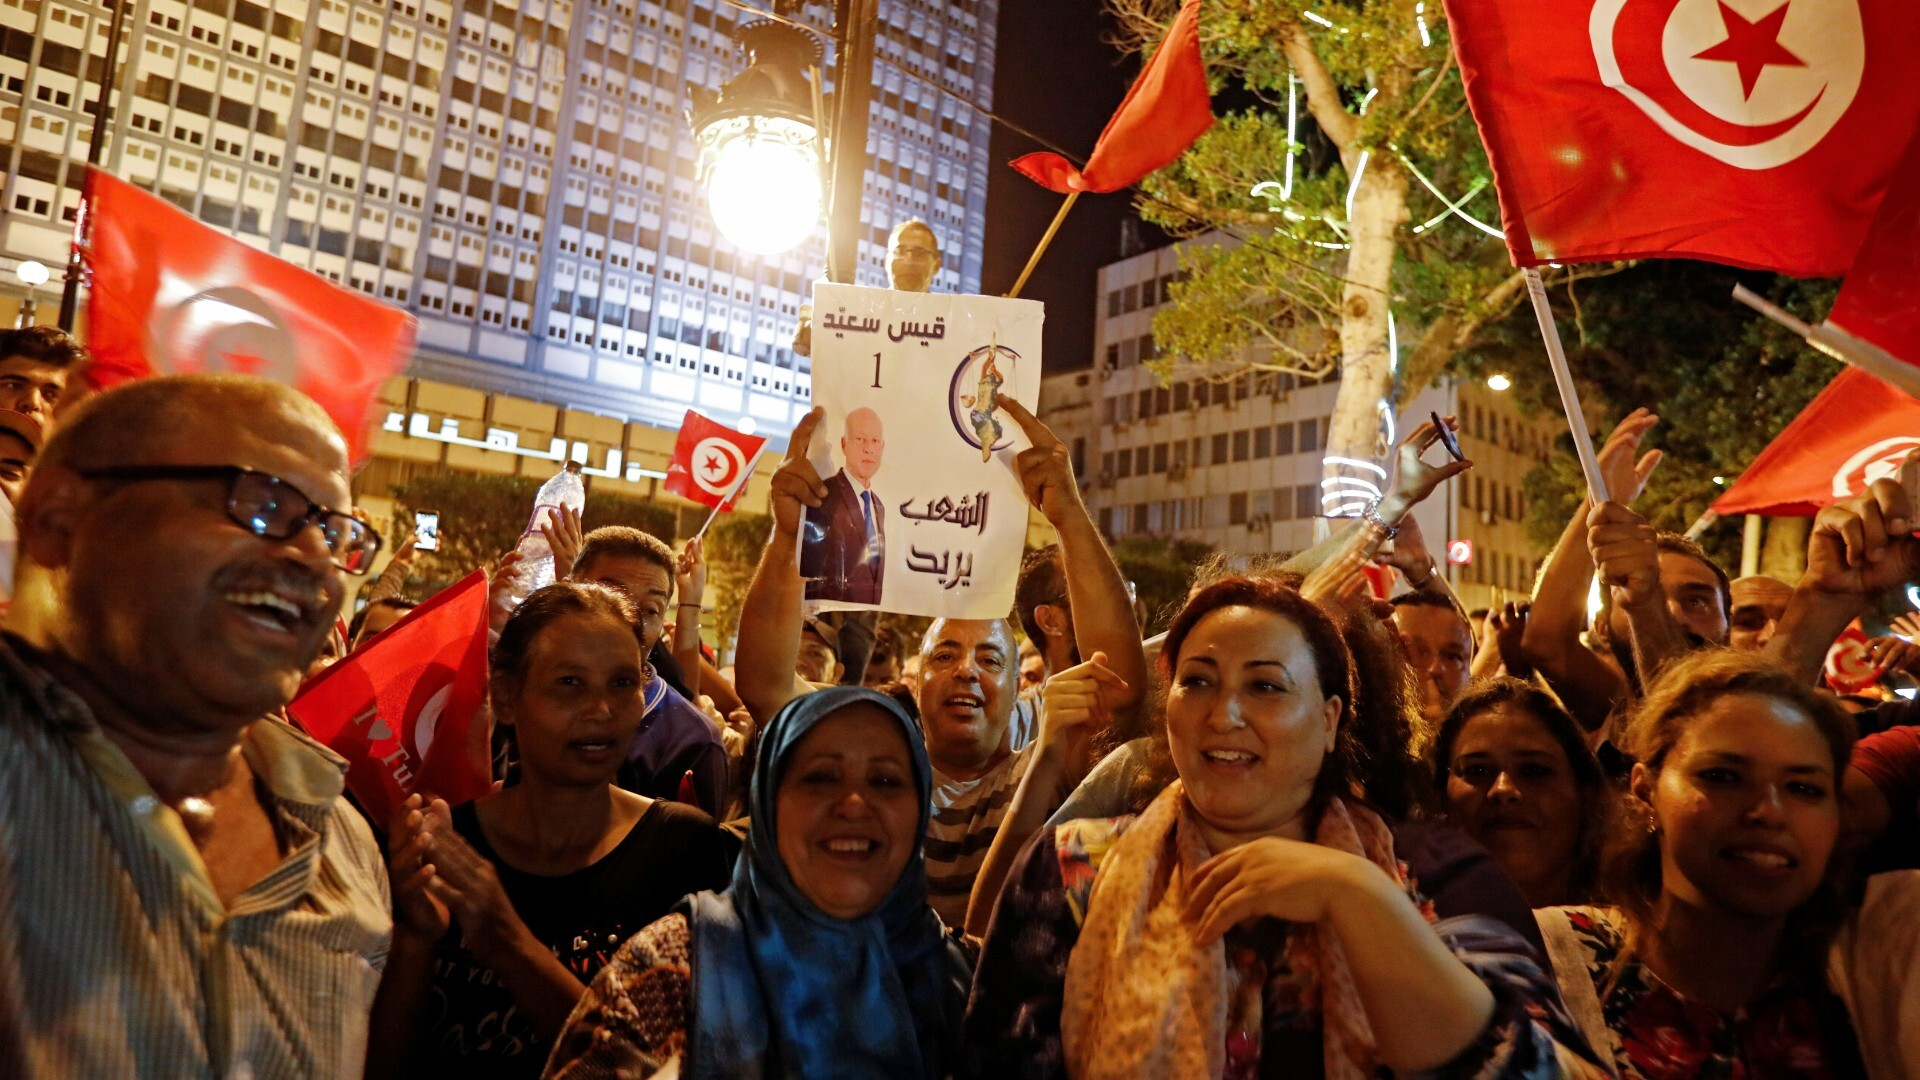 Tunisia election: New President Saied promises to fix economy